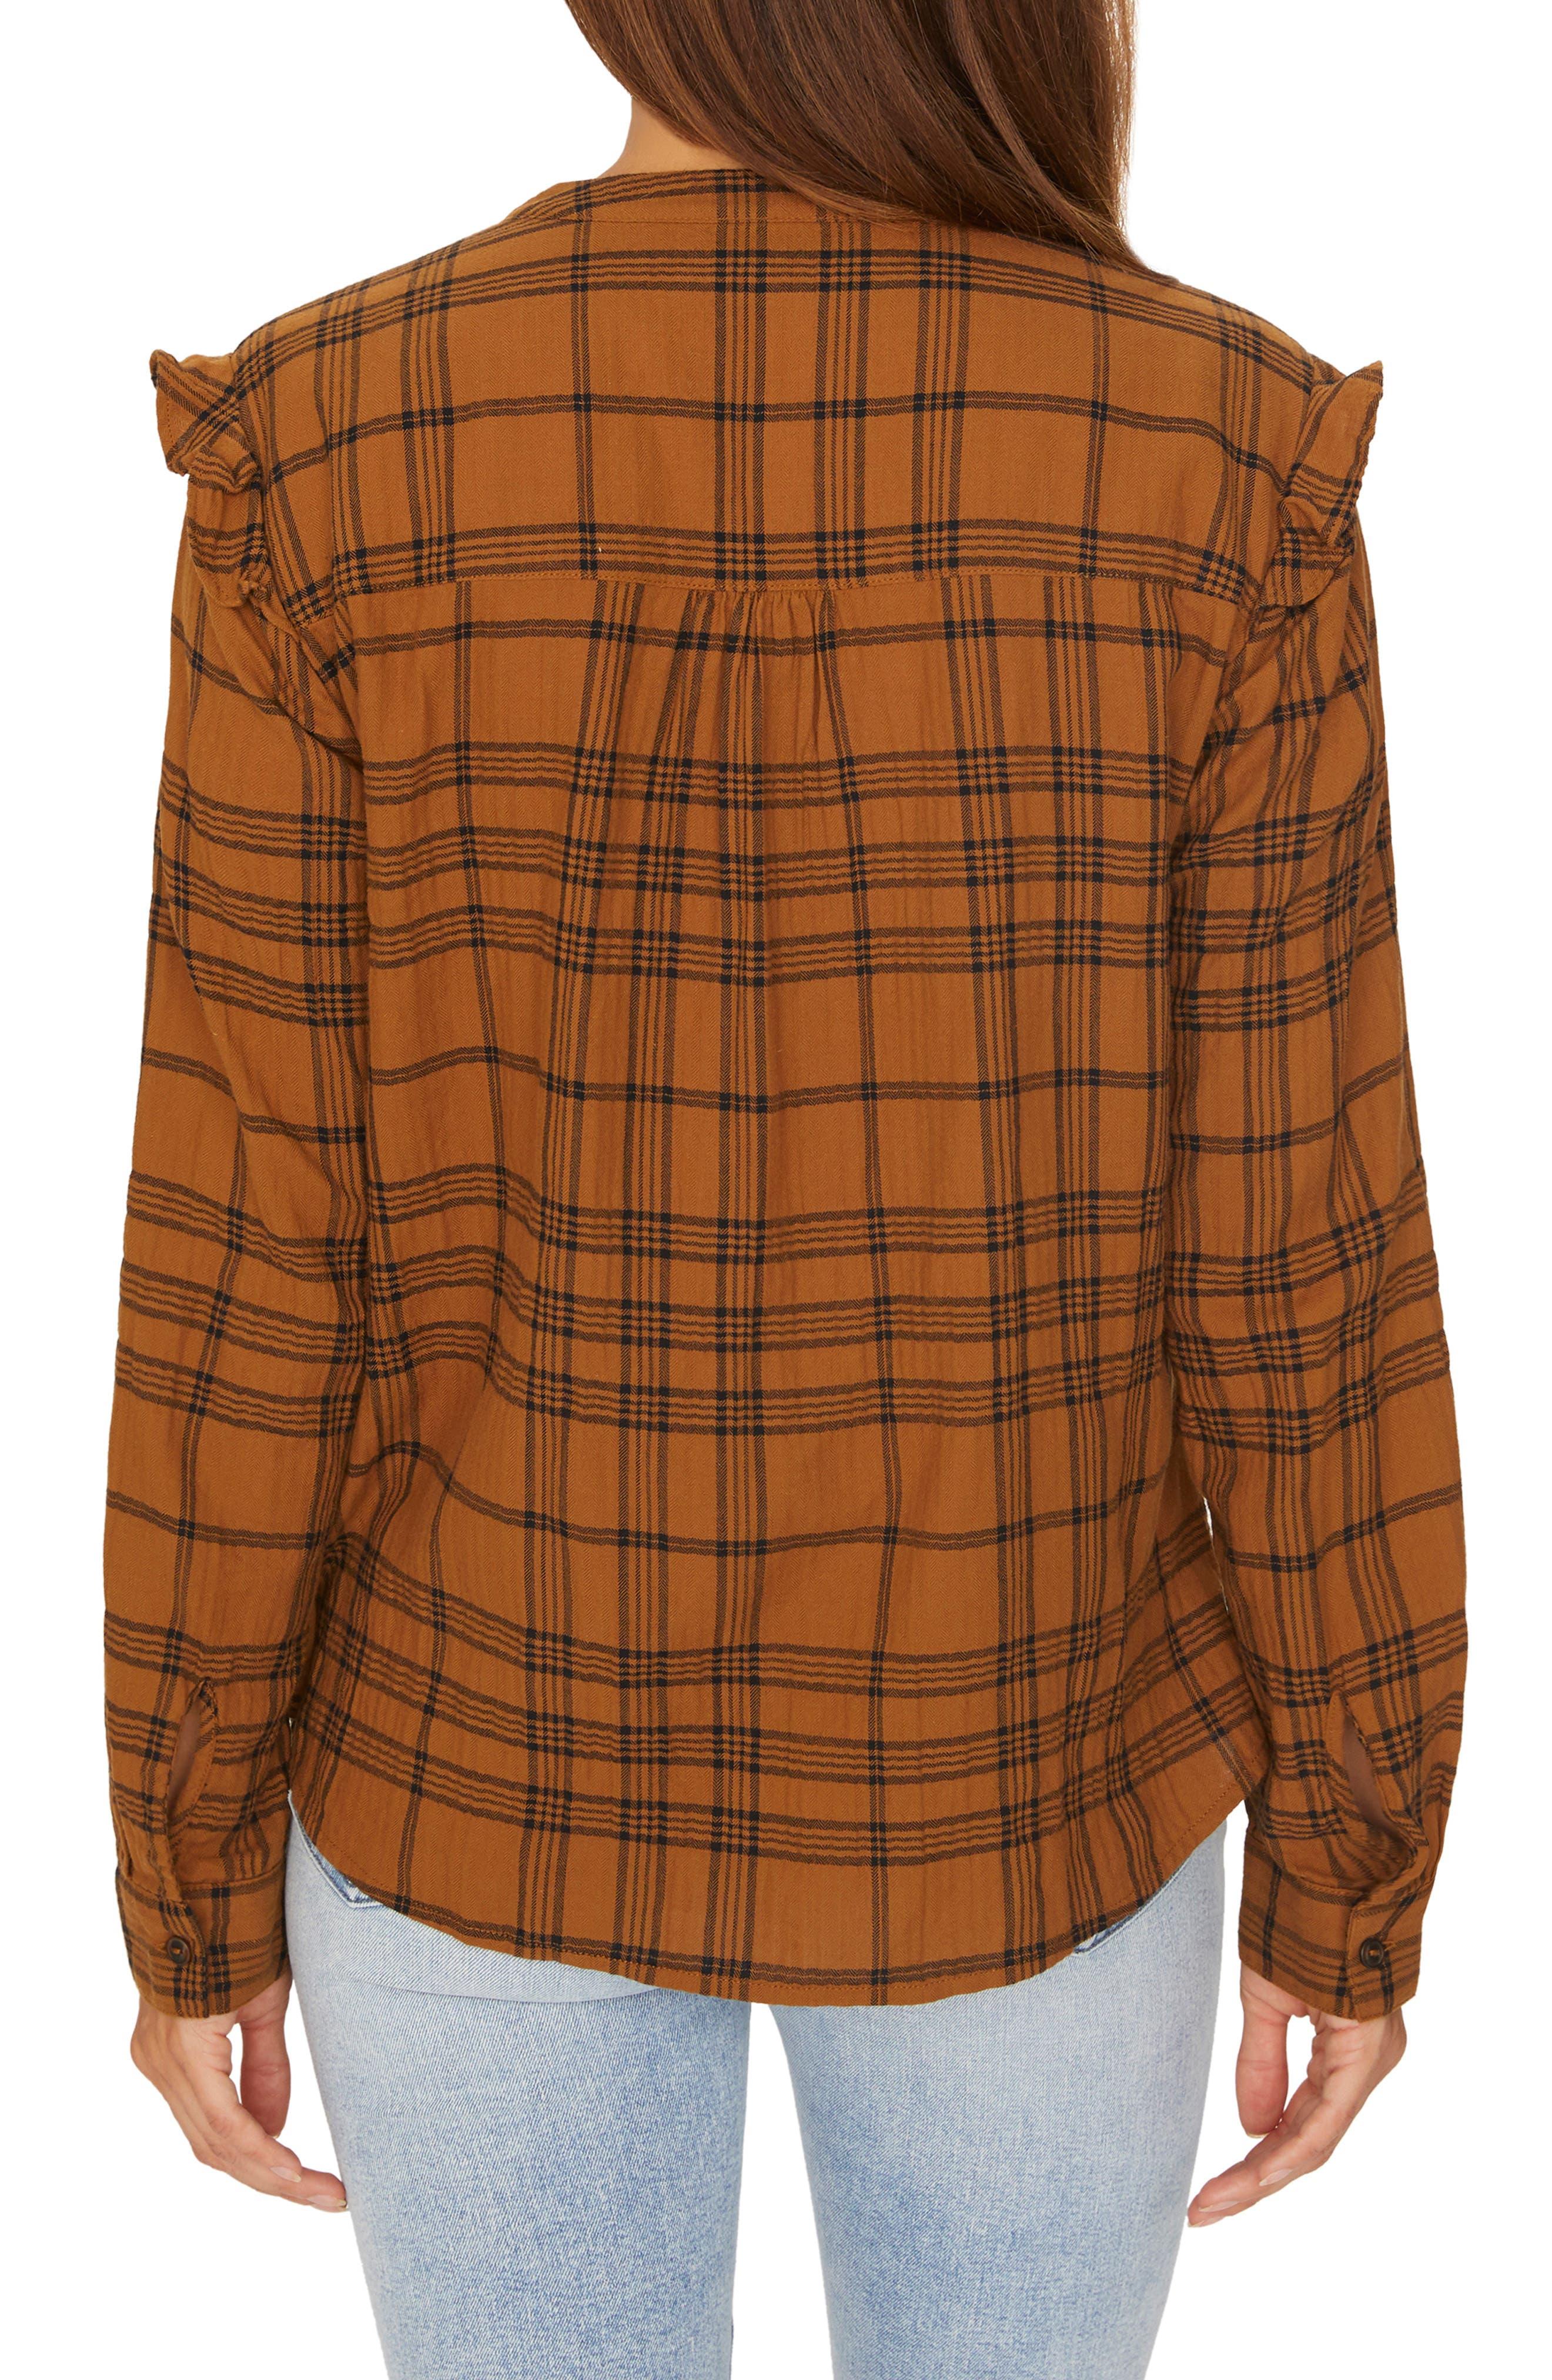 Hill St. Ruffled Plaid Shirt,                             Alternate thumbnail 2, color,                             AUTUMN PLAID